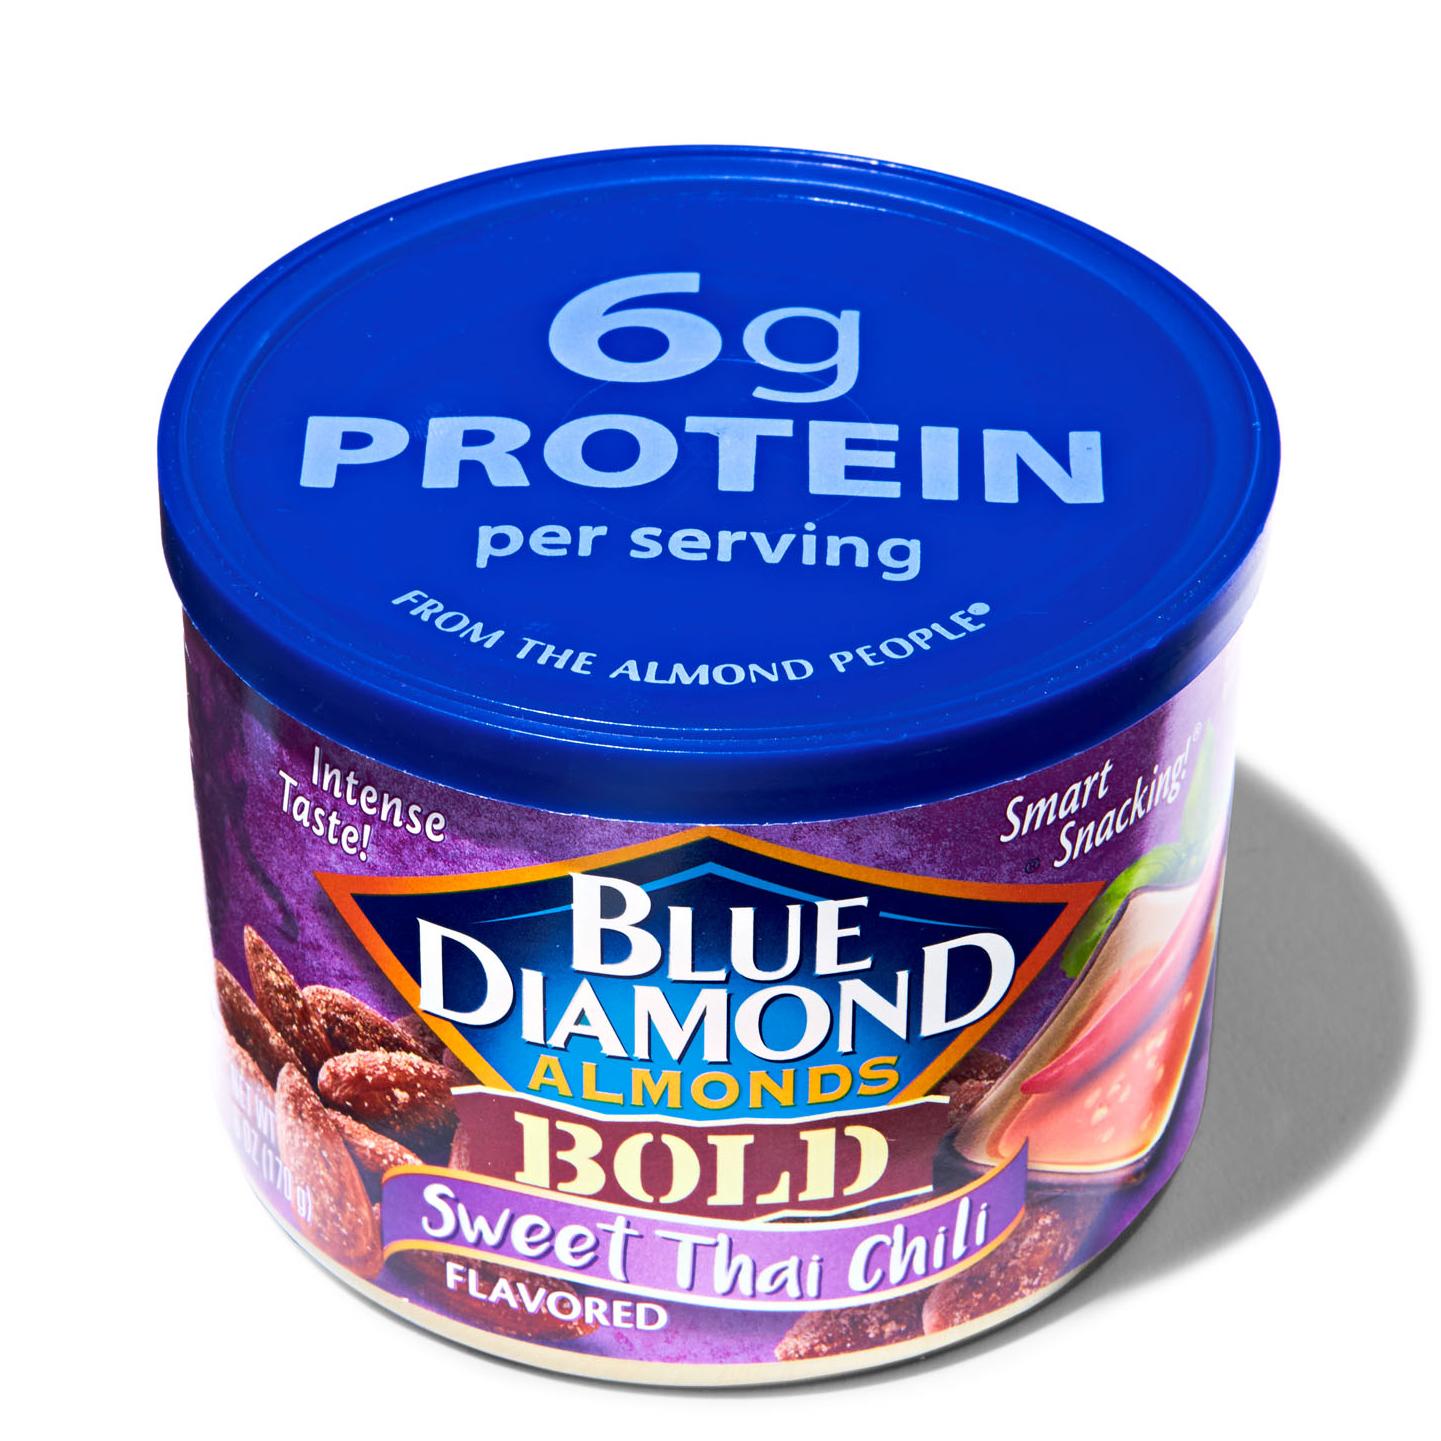 blue diamod almonds